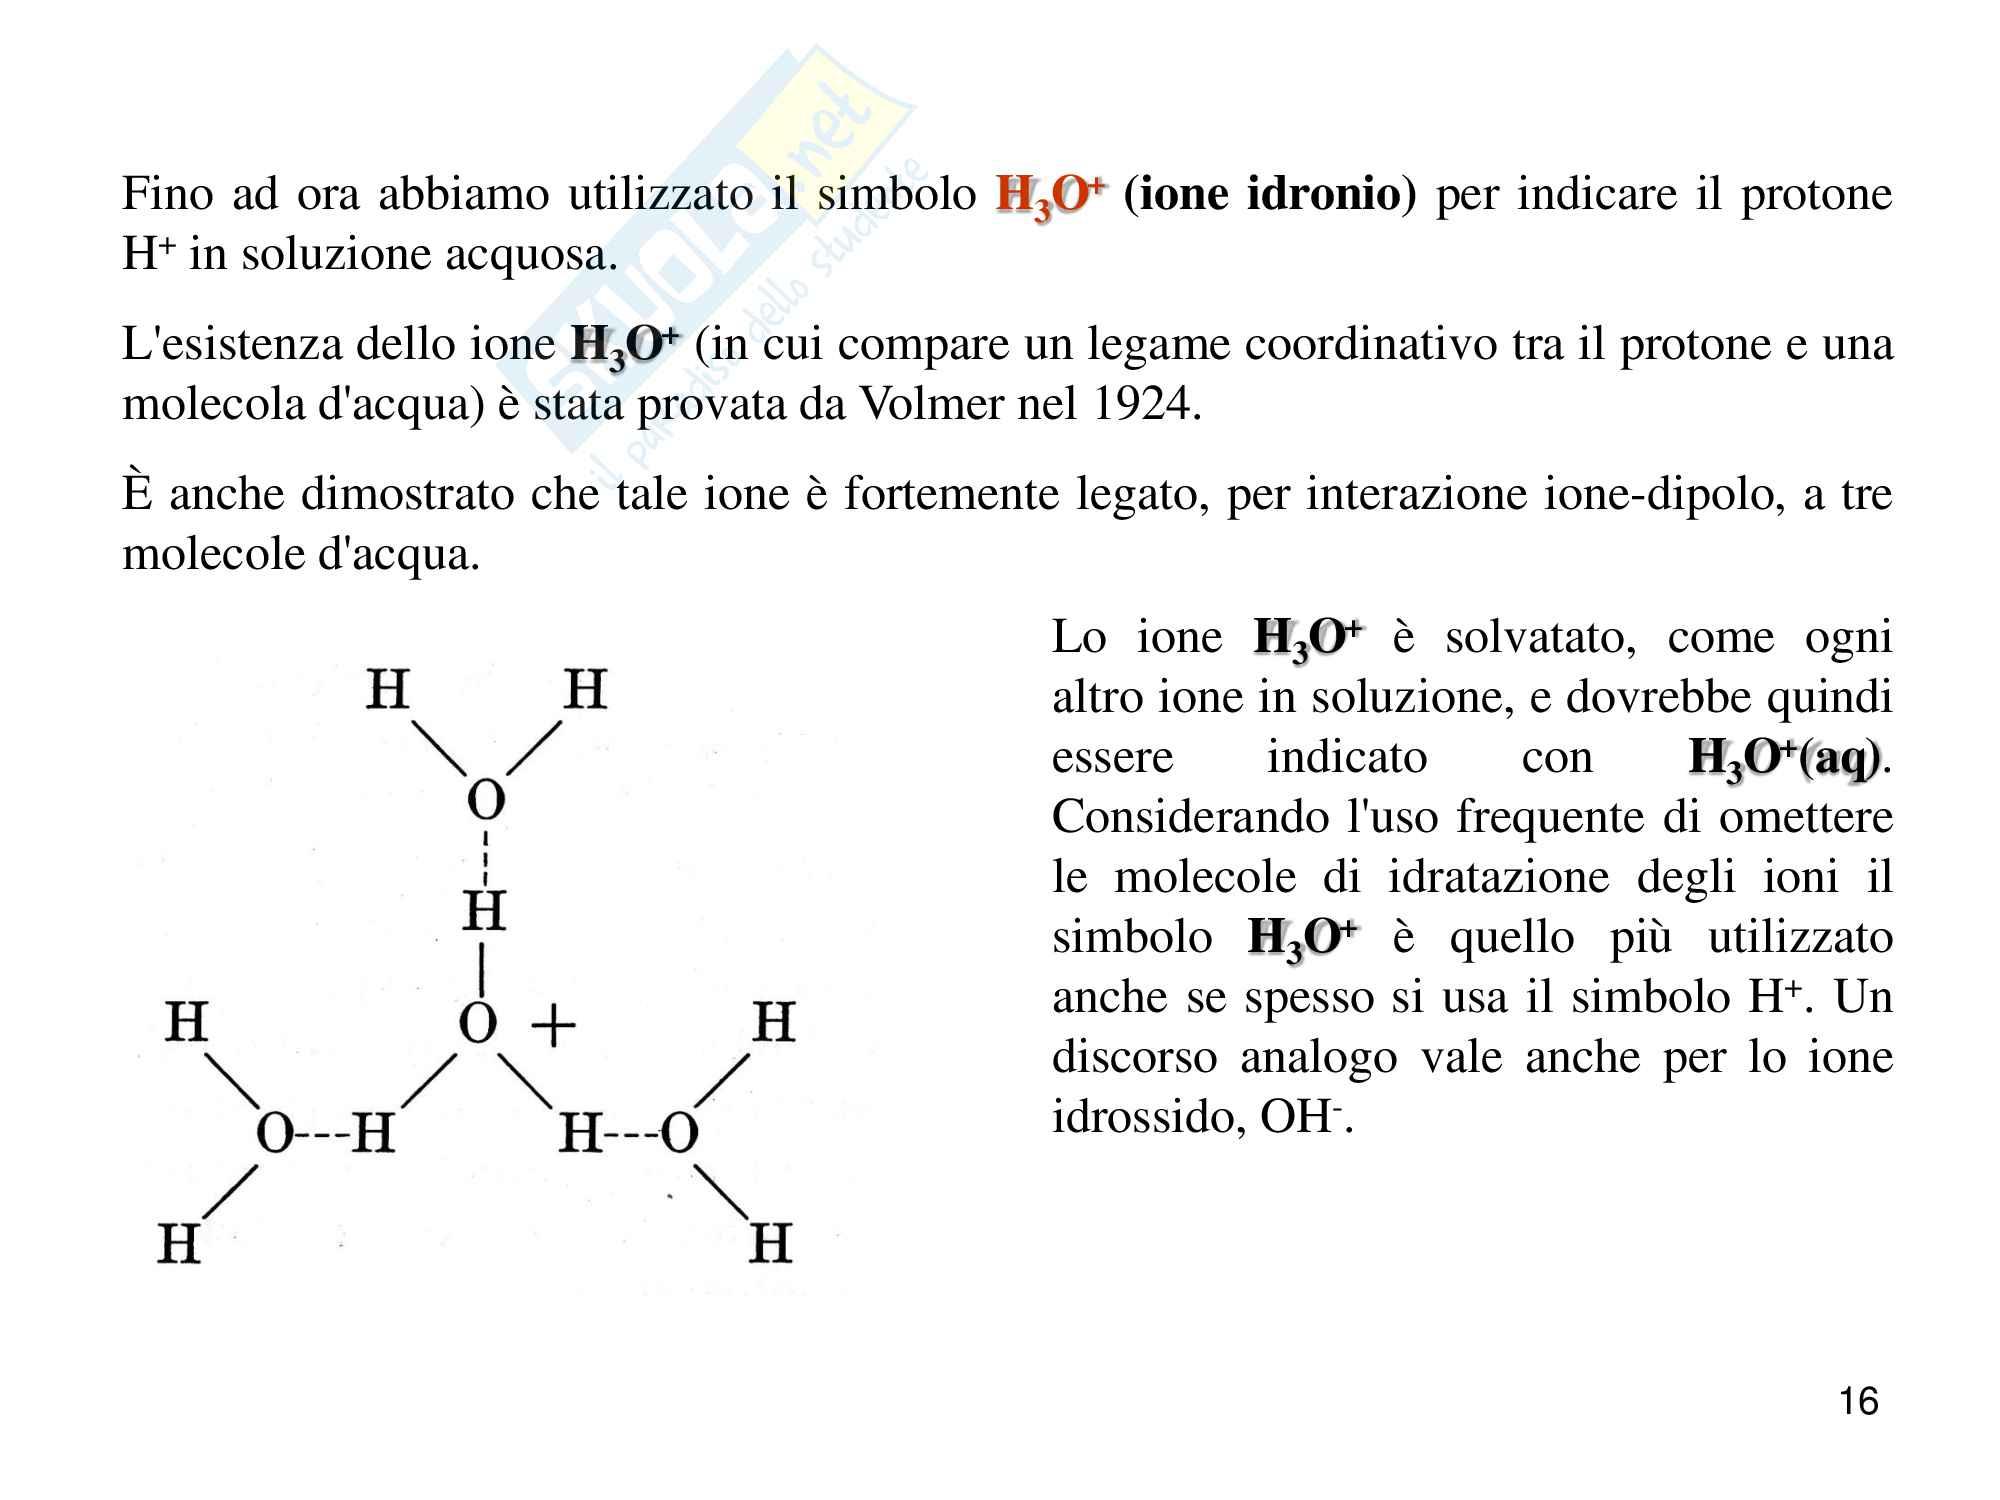 Chimica analitica, equilibrio acido base Pag. 16